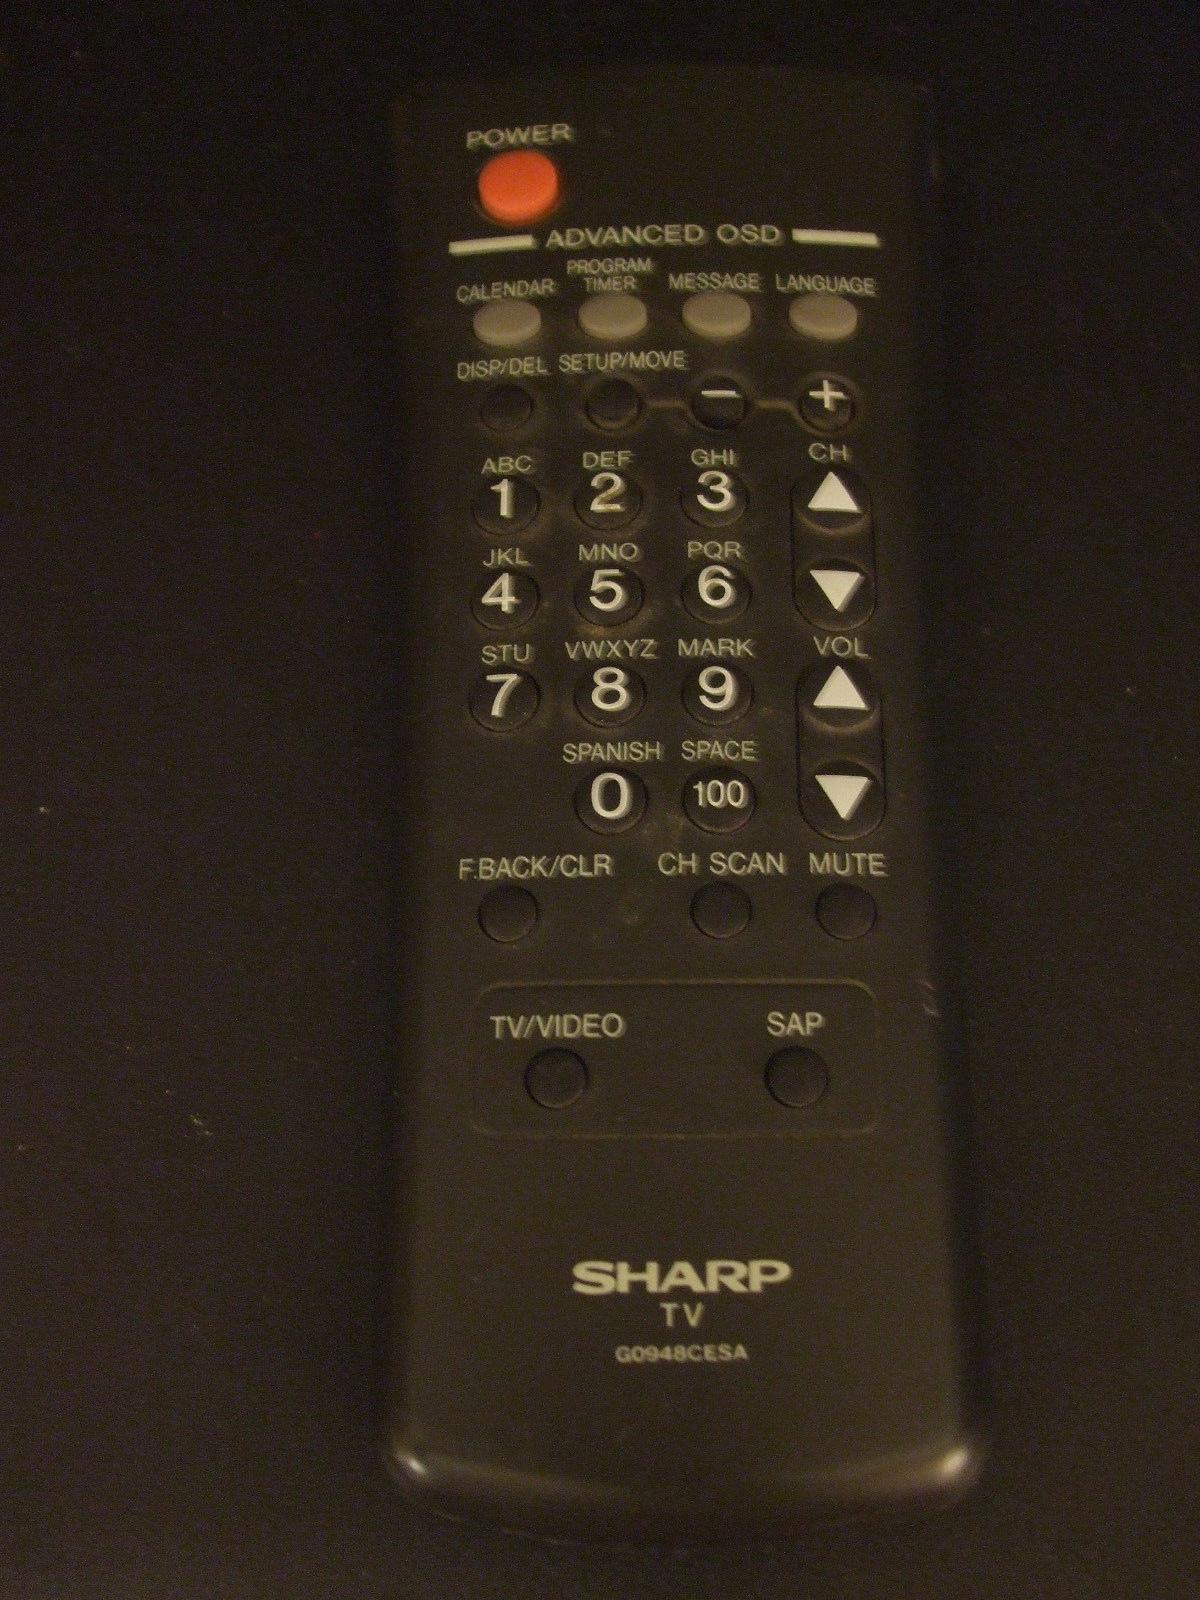 Program hughes hrmc-15 remote